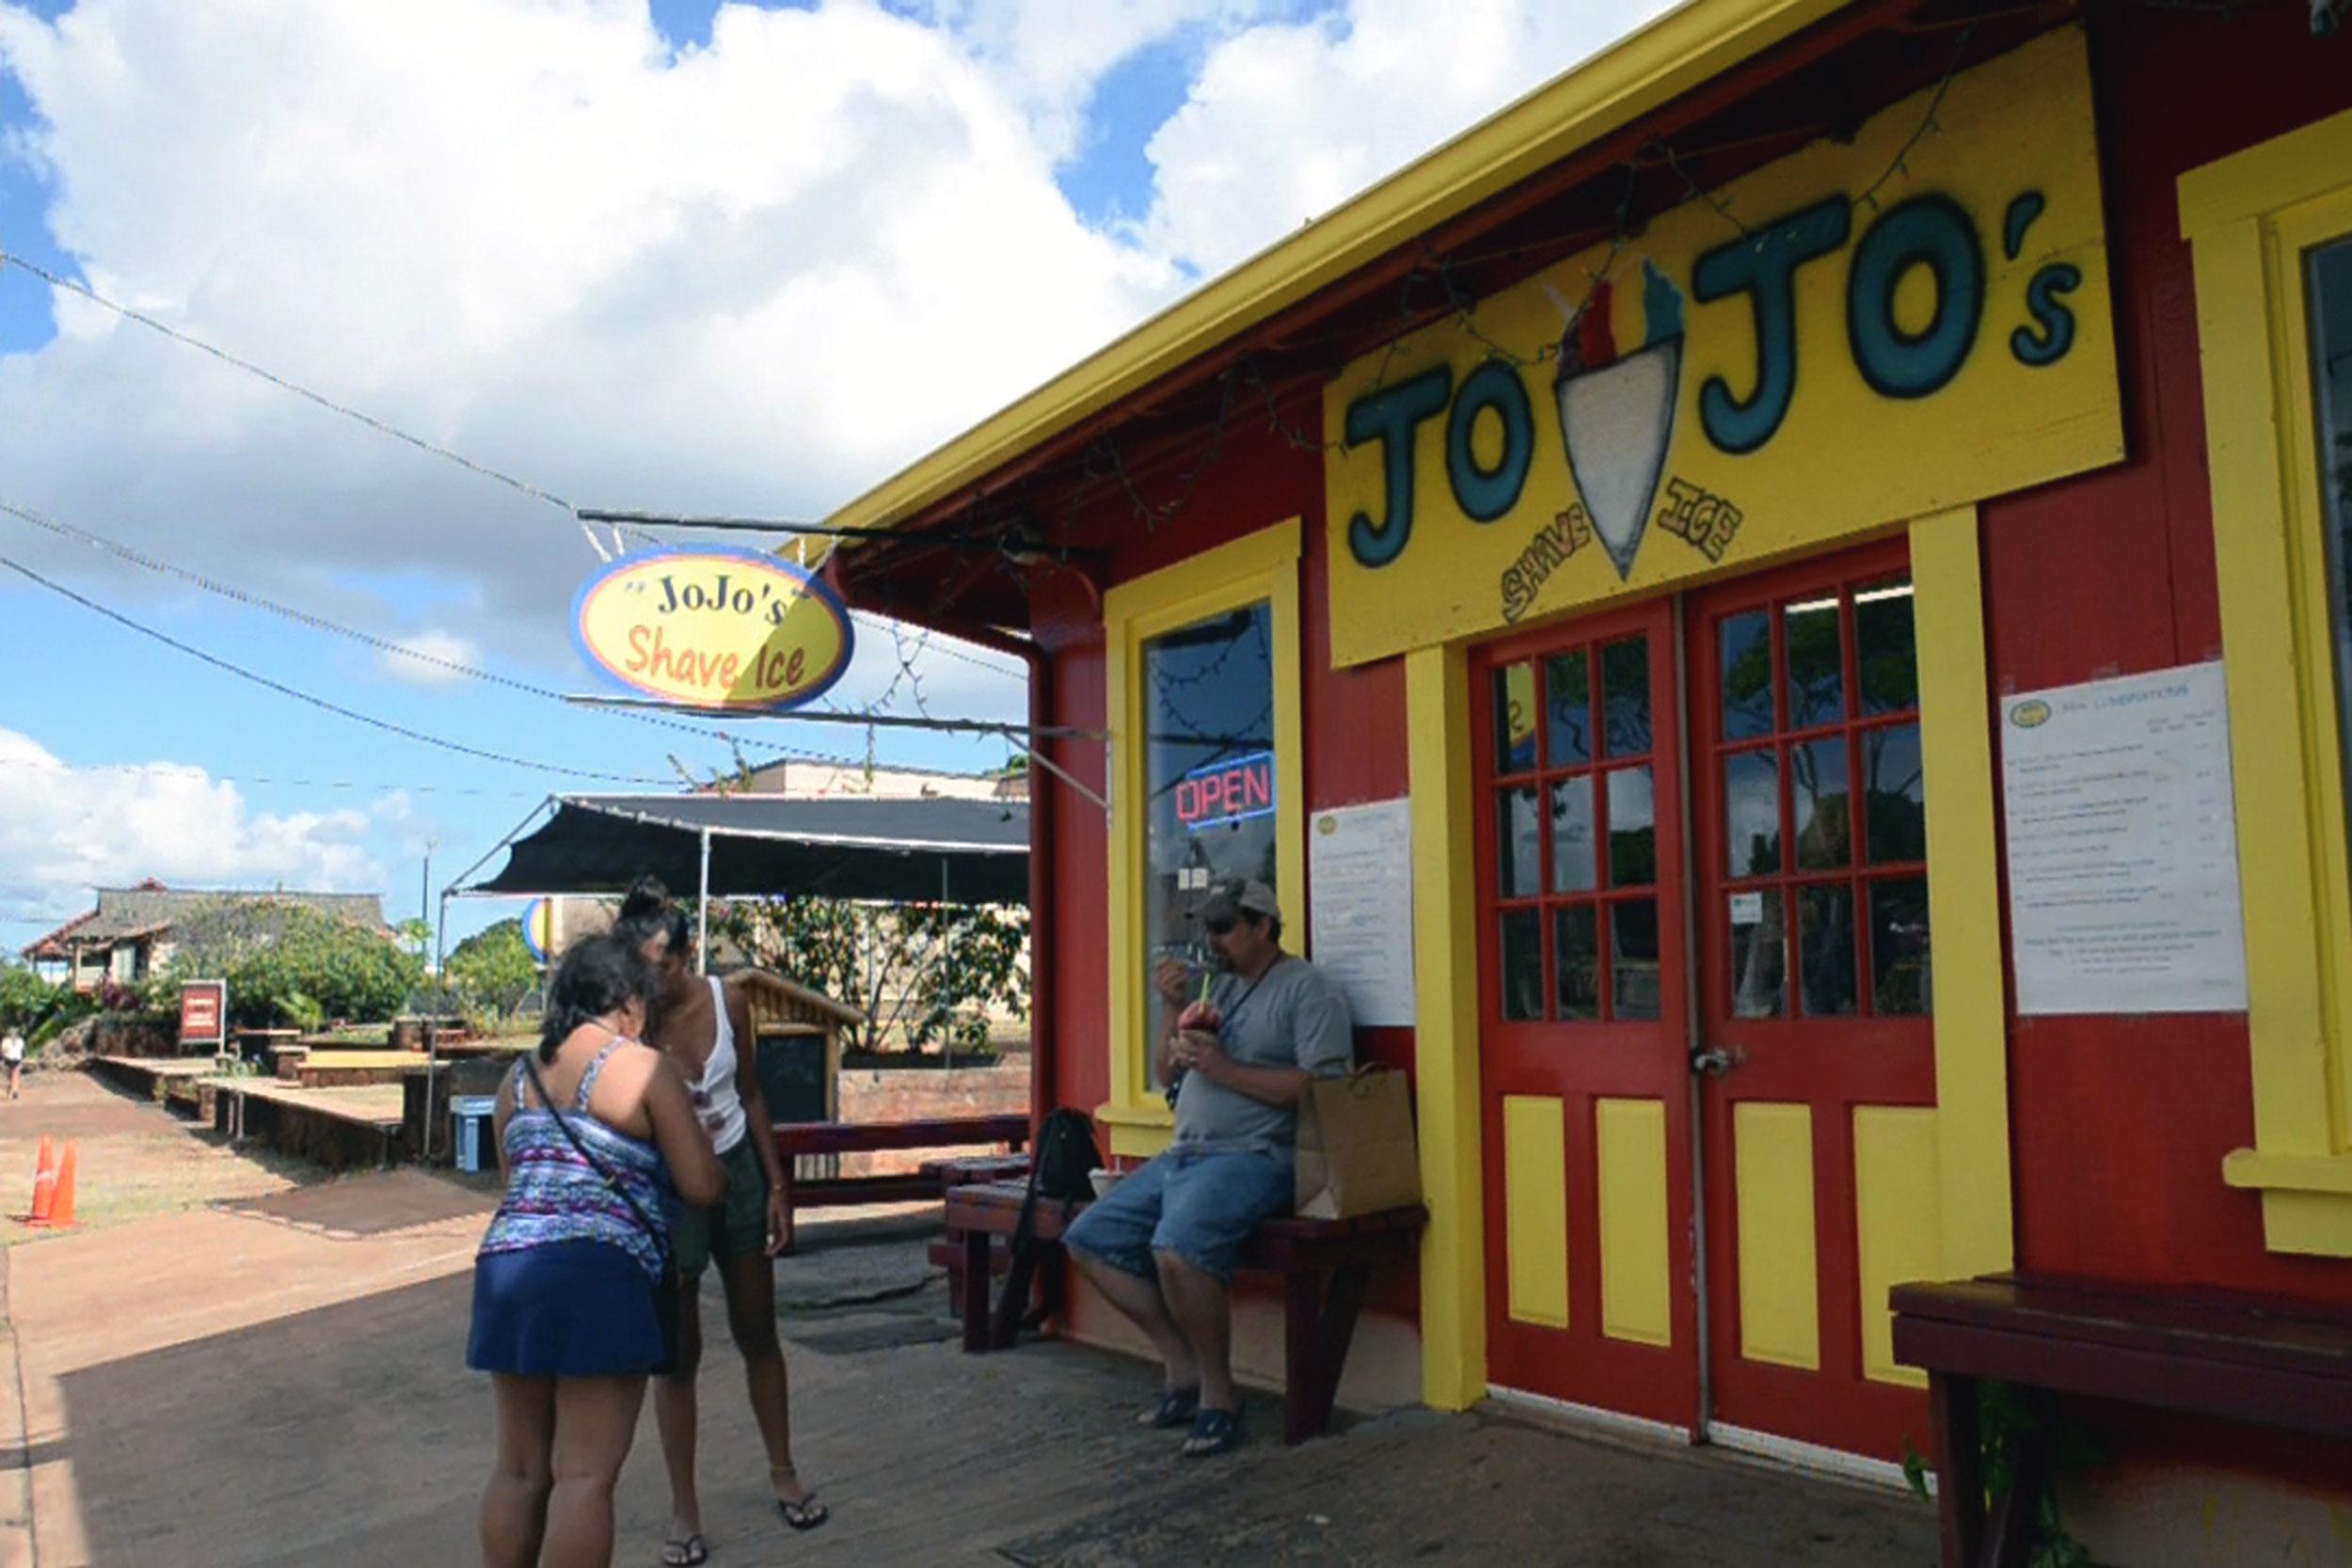 JoJo's Shave Ice